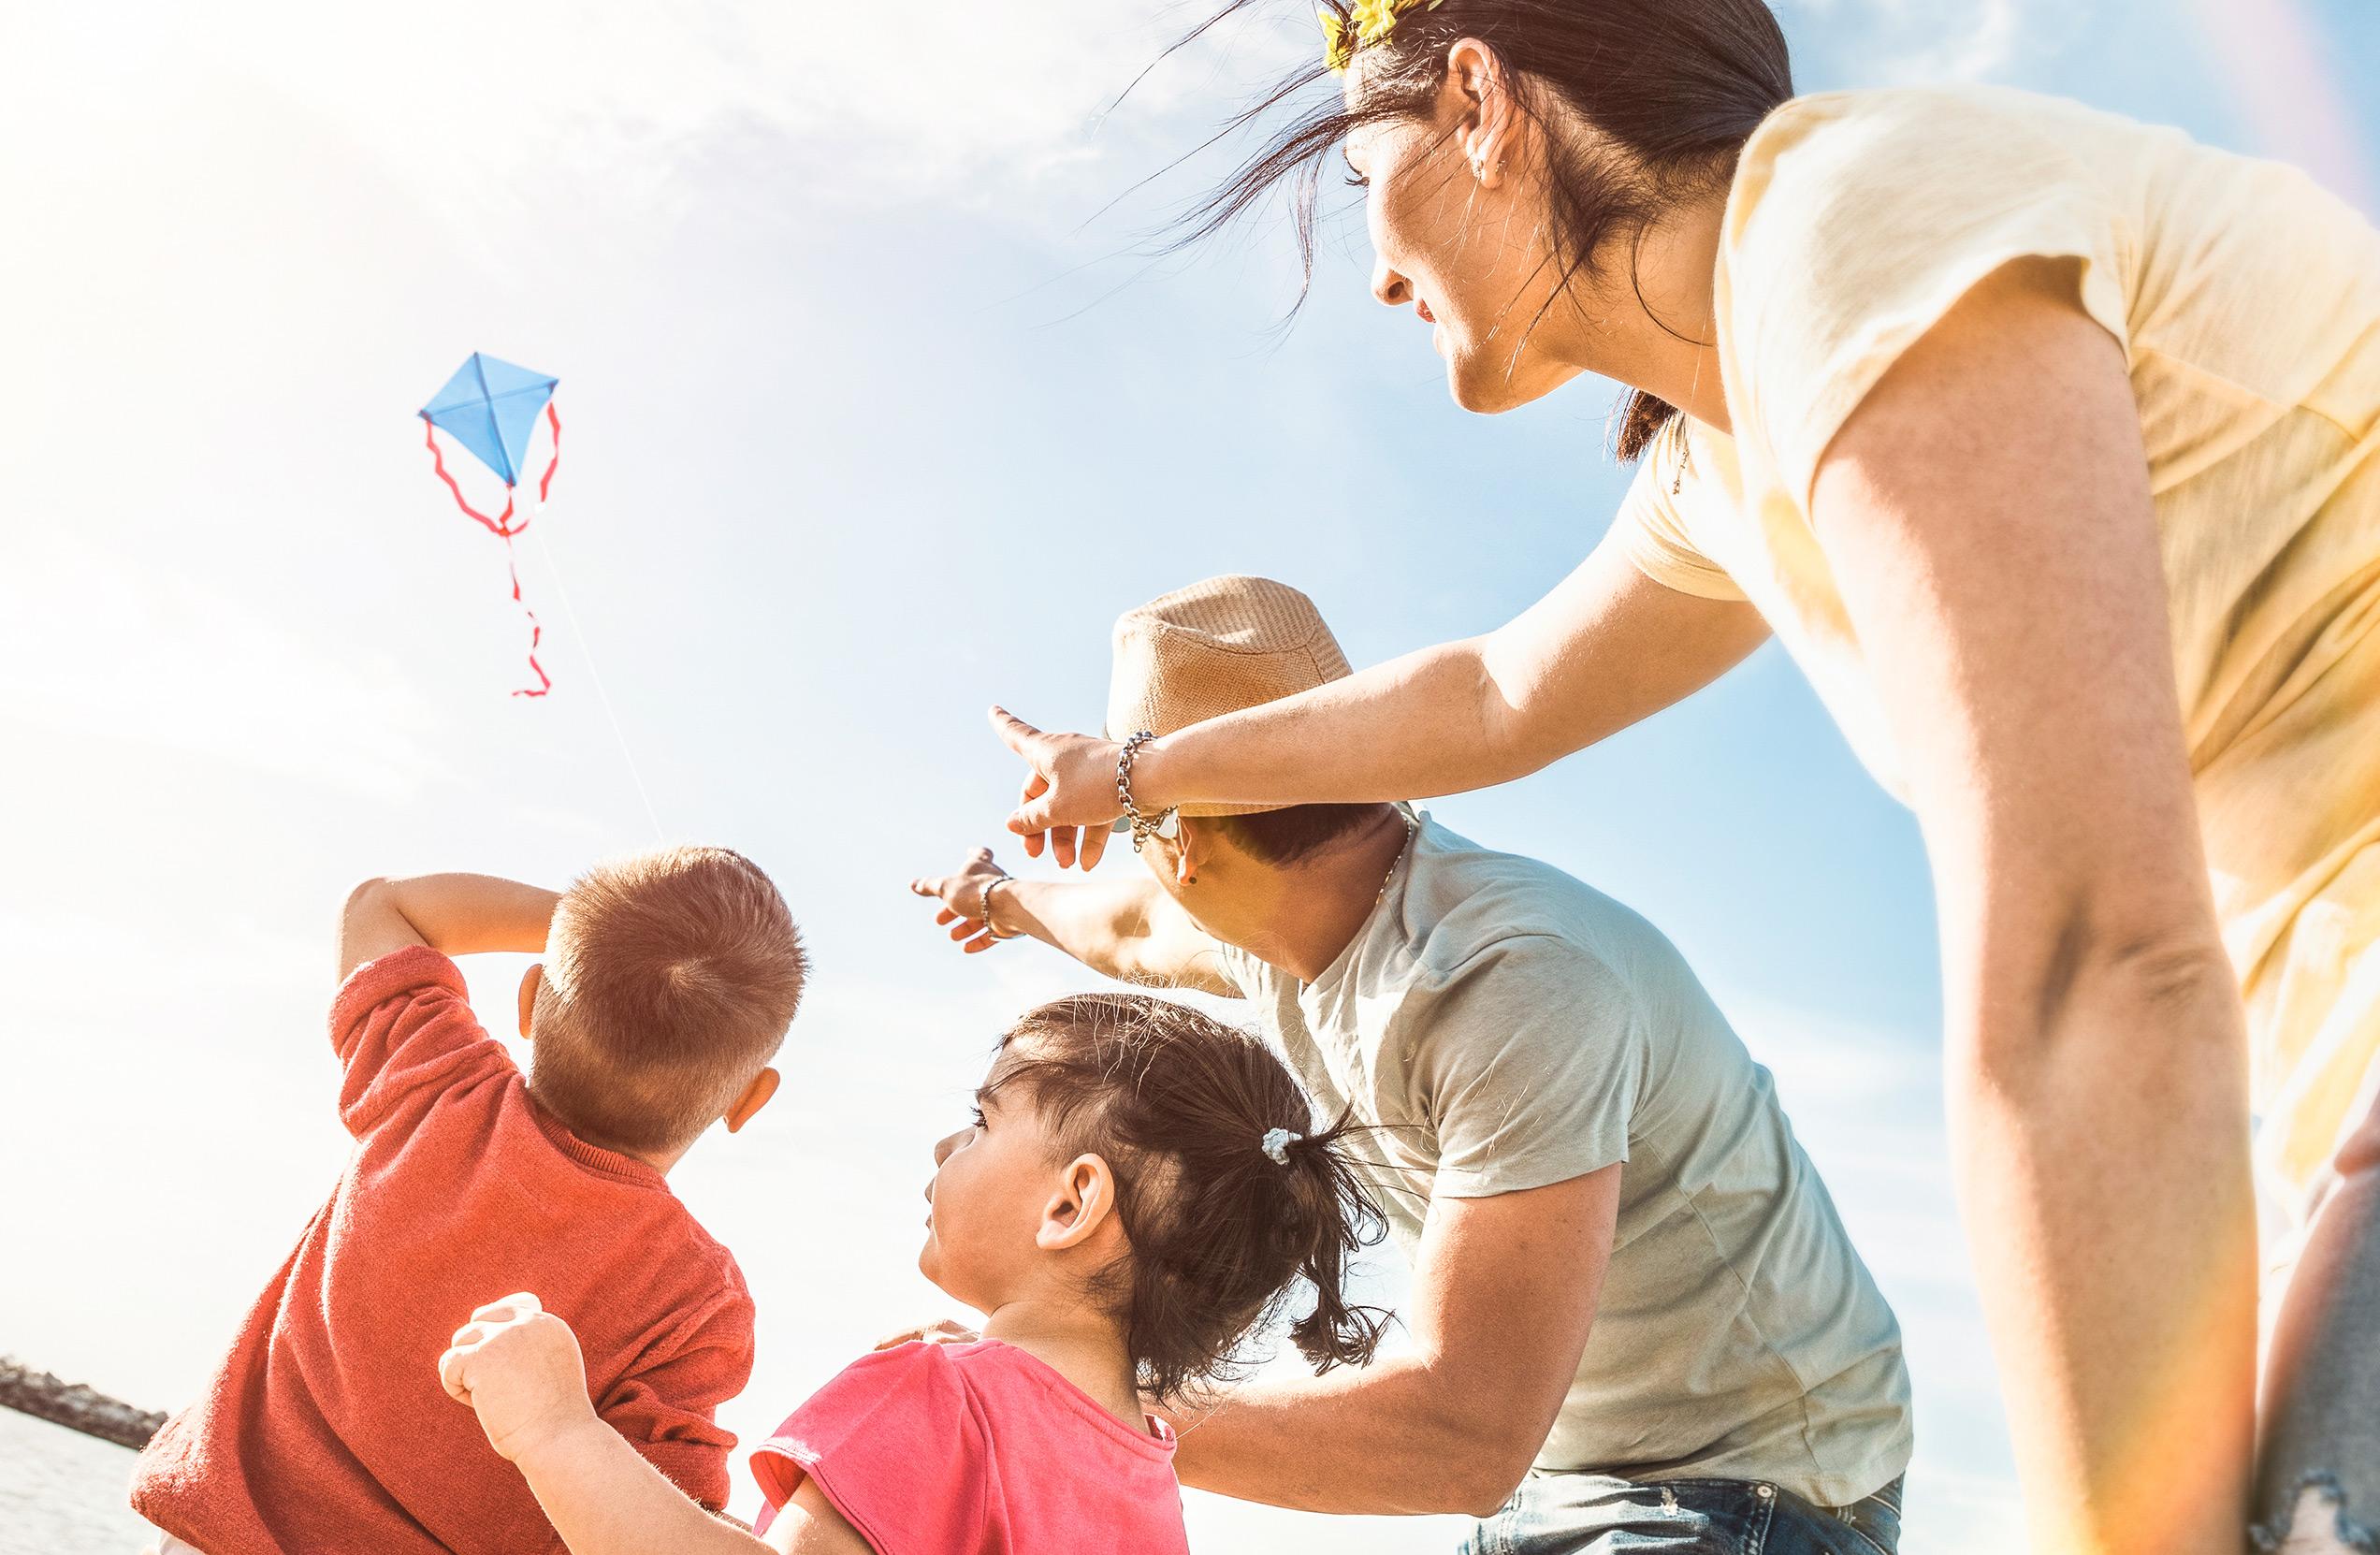 Bayshore Villas-Apartments-Family flying kite-San Juan, PR